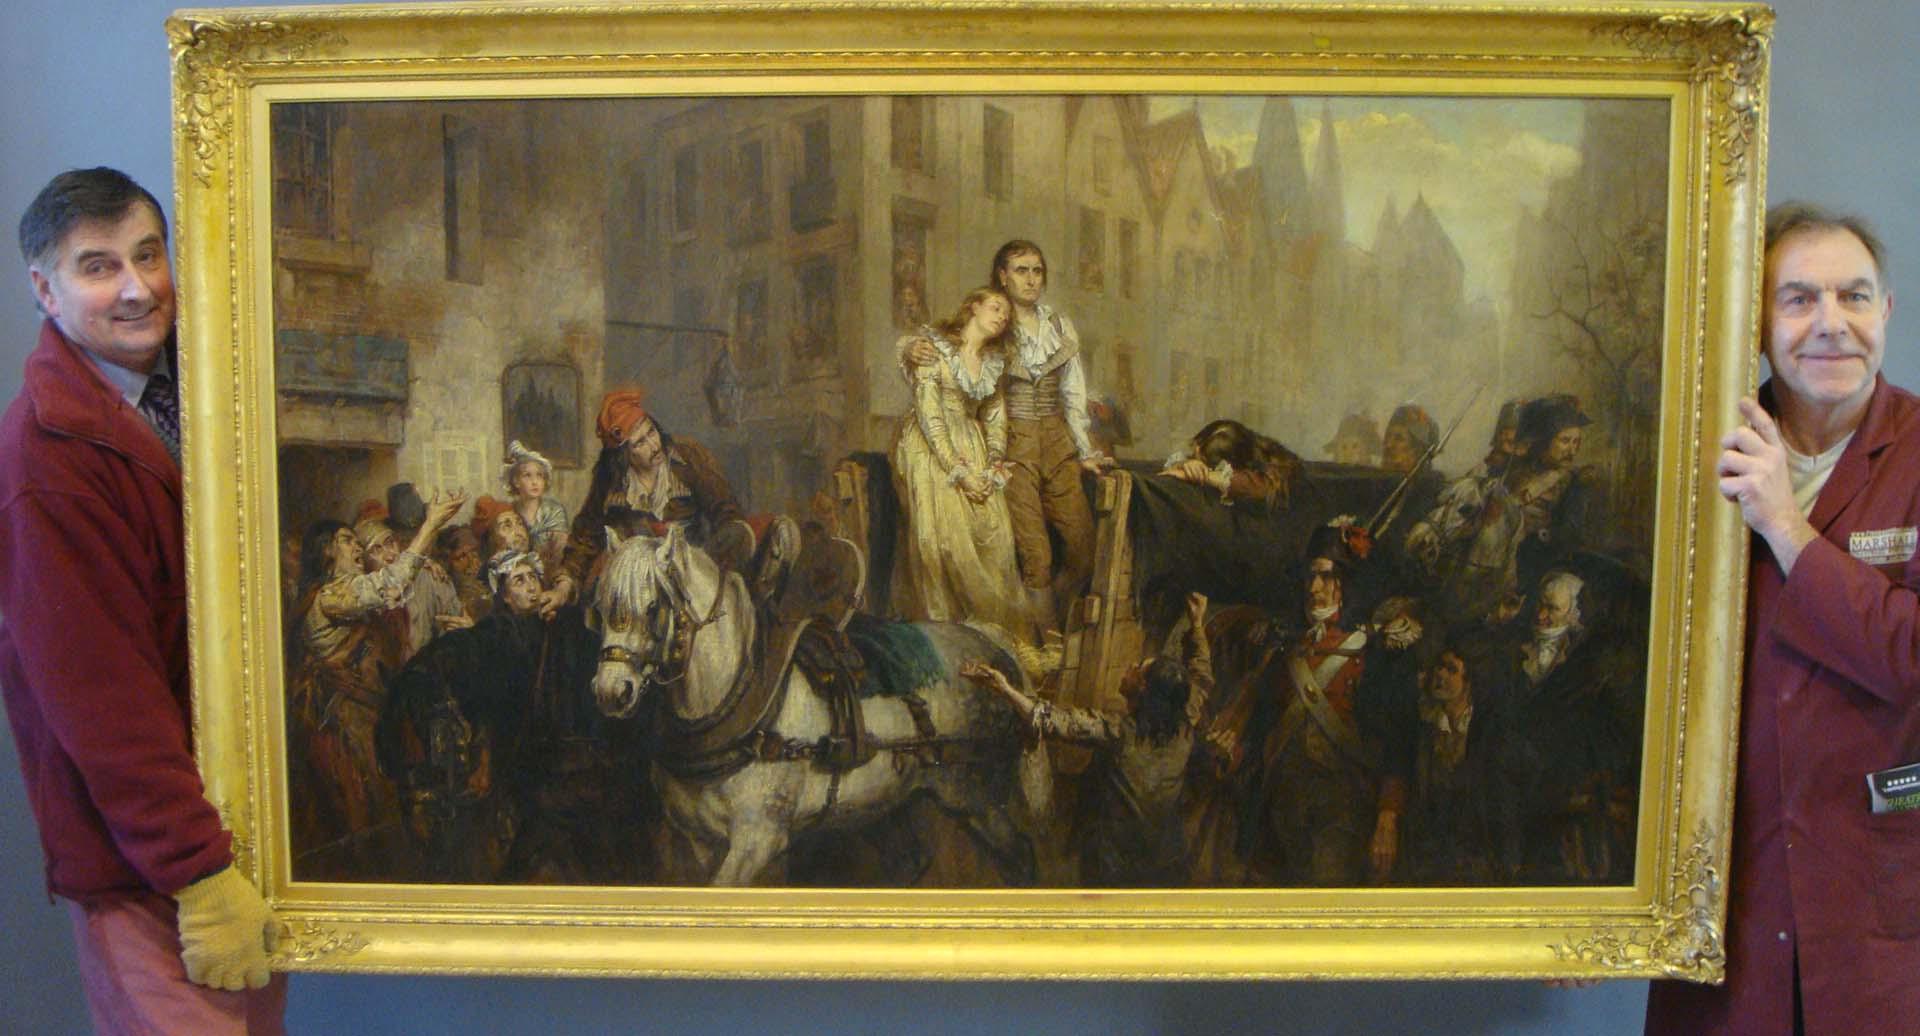 Lot 1061 - Laslett John Pott (1837-1898), 'O Liberte! Que decorative crimes on comment en ton nom!' (Oh